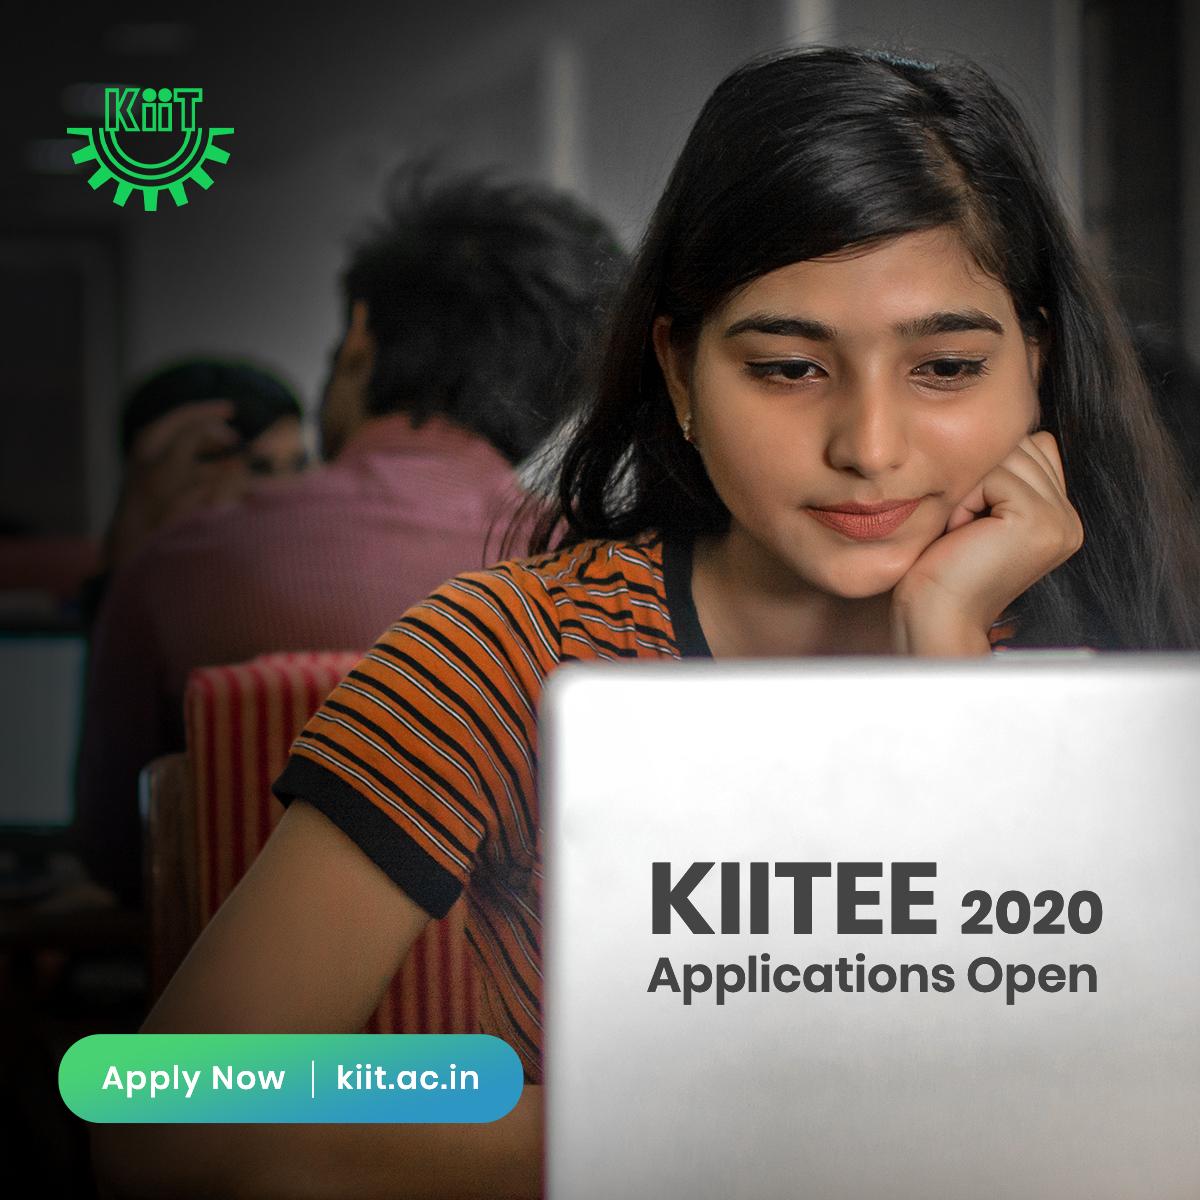 Kiitee Kiit Entrance Exam 2020 Online Application Form Apply For Free